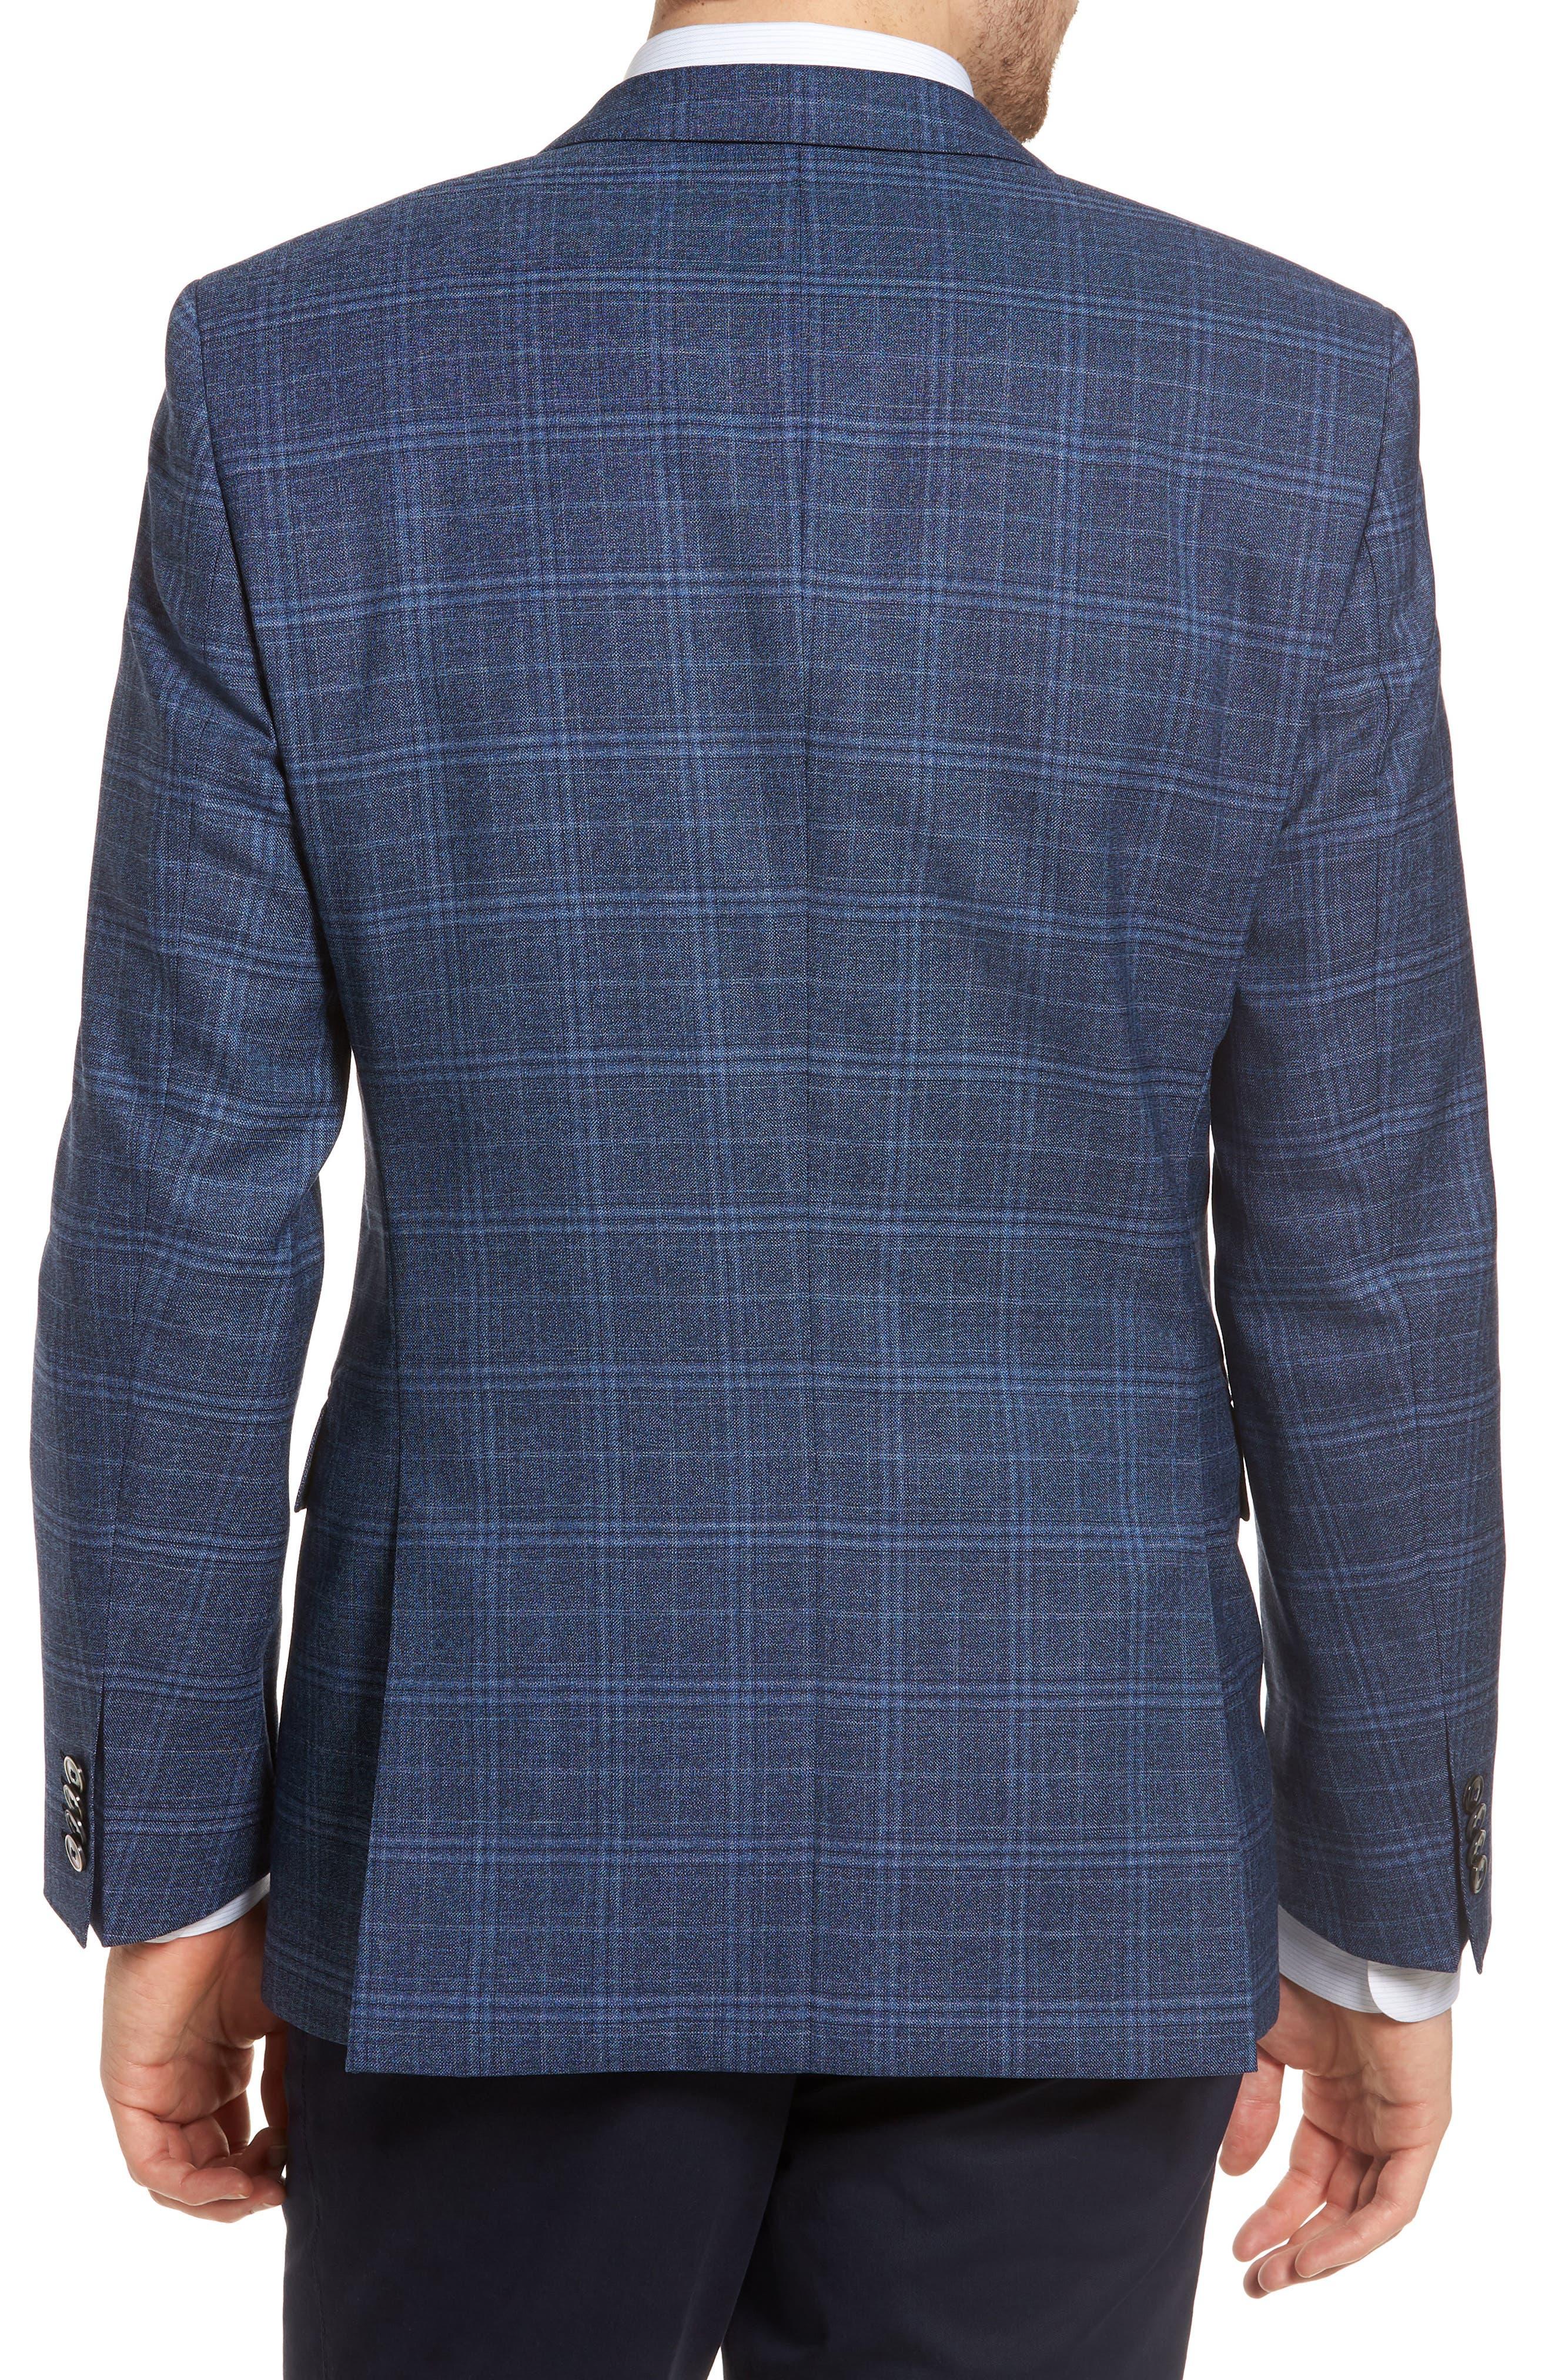 Hutsons Trim Fit Plaid Wool Sport Coat,                             Alternate thumbnail 2, color,                             Medium Blue/ Navy